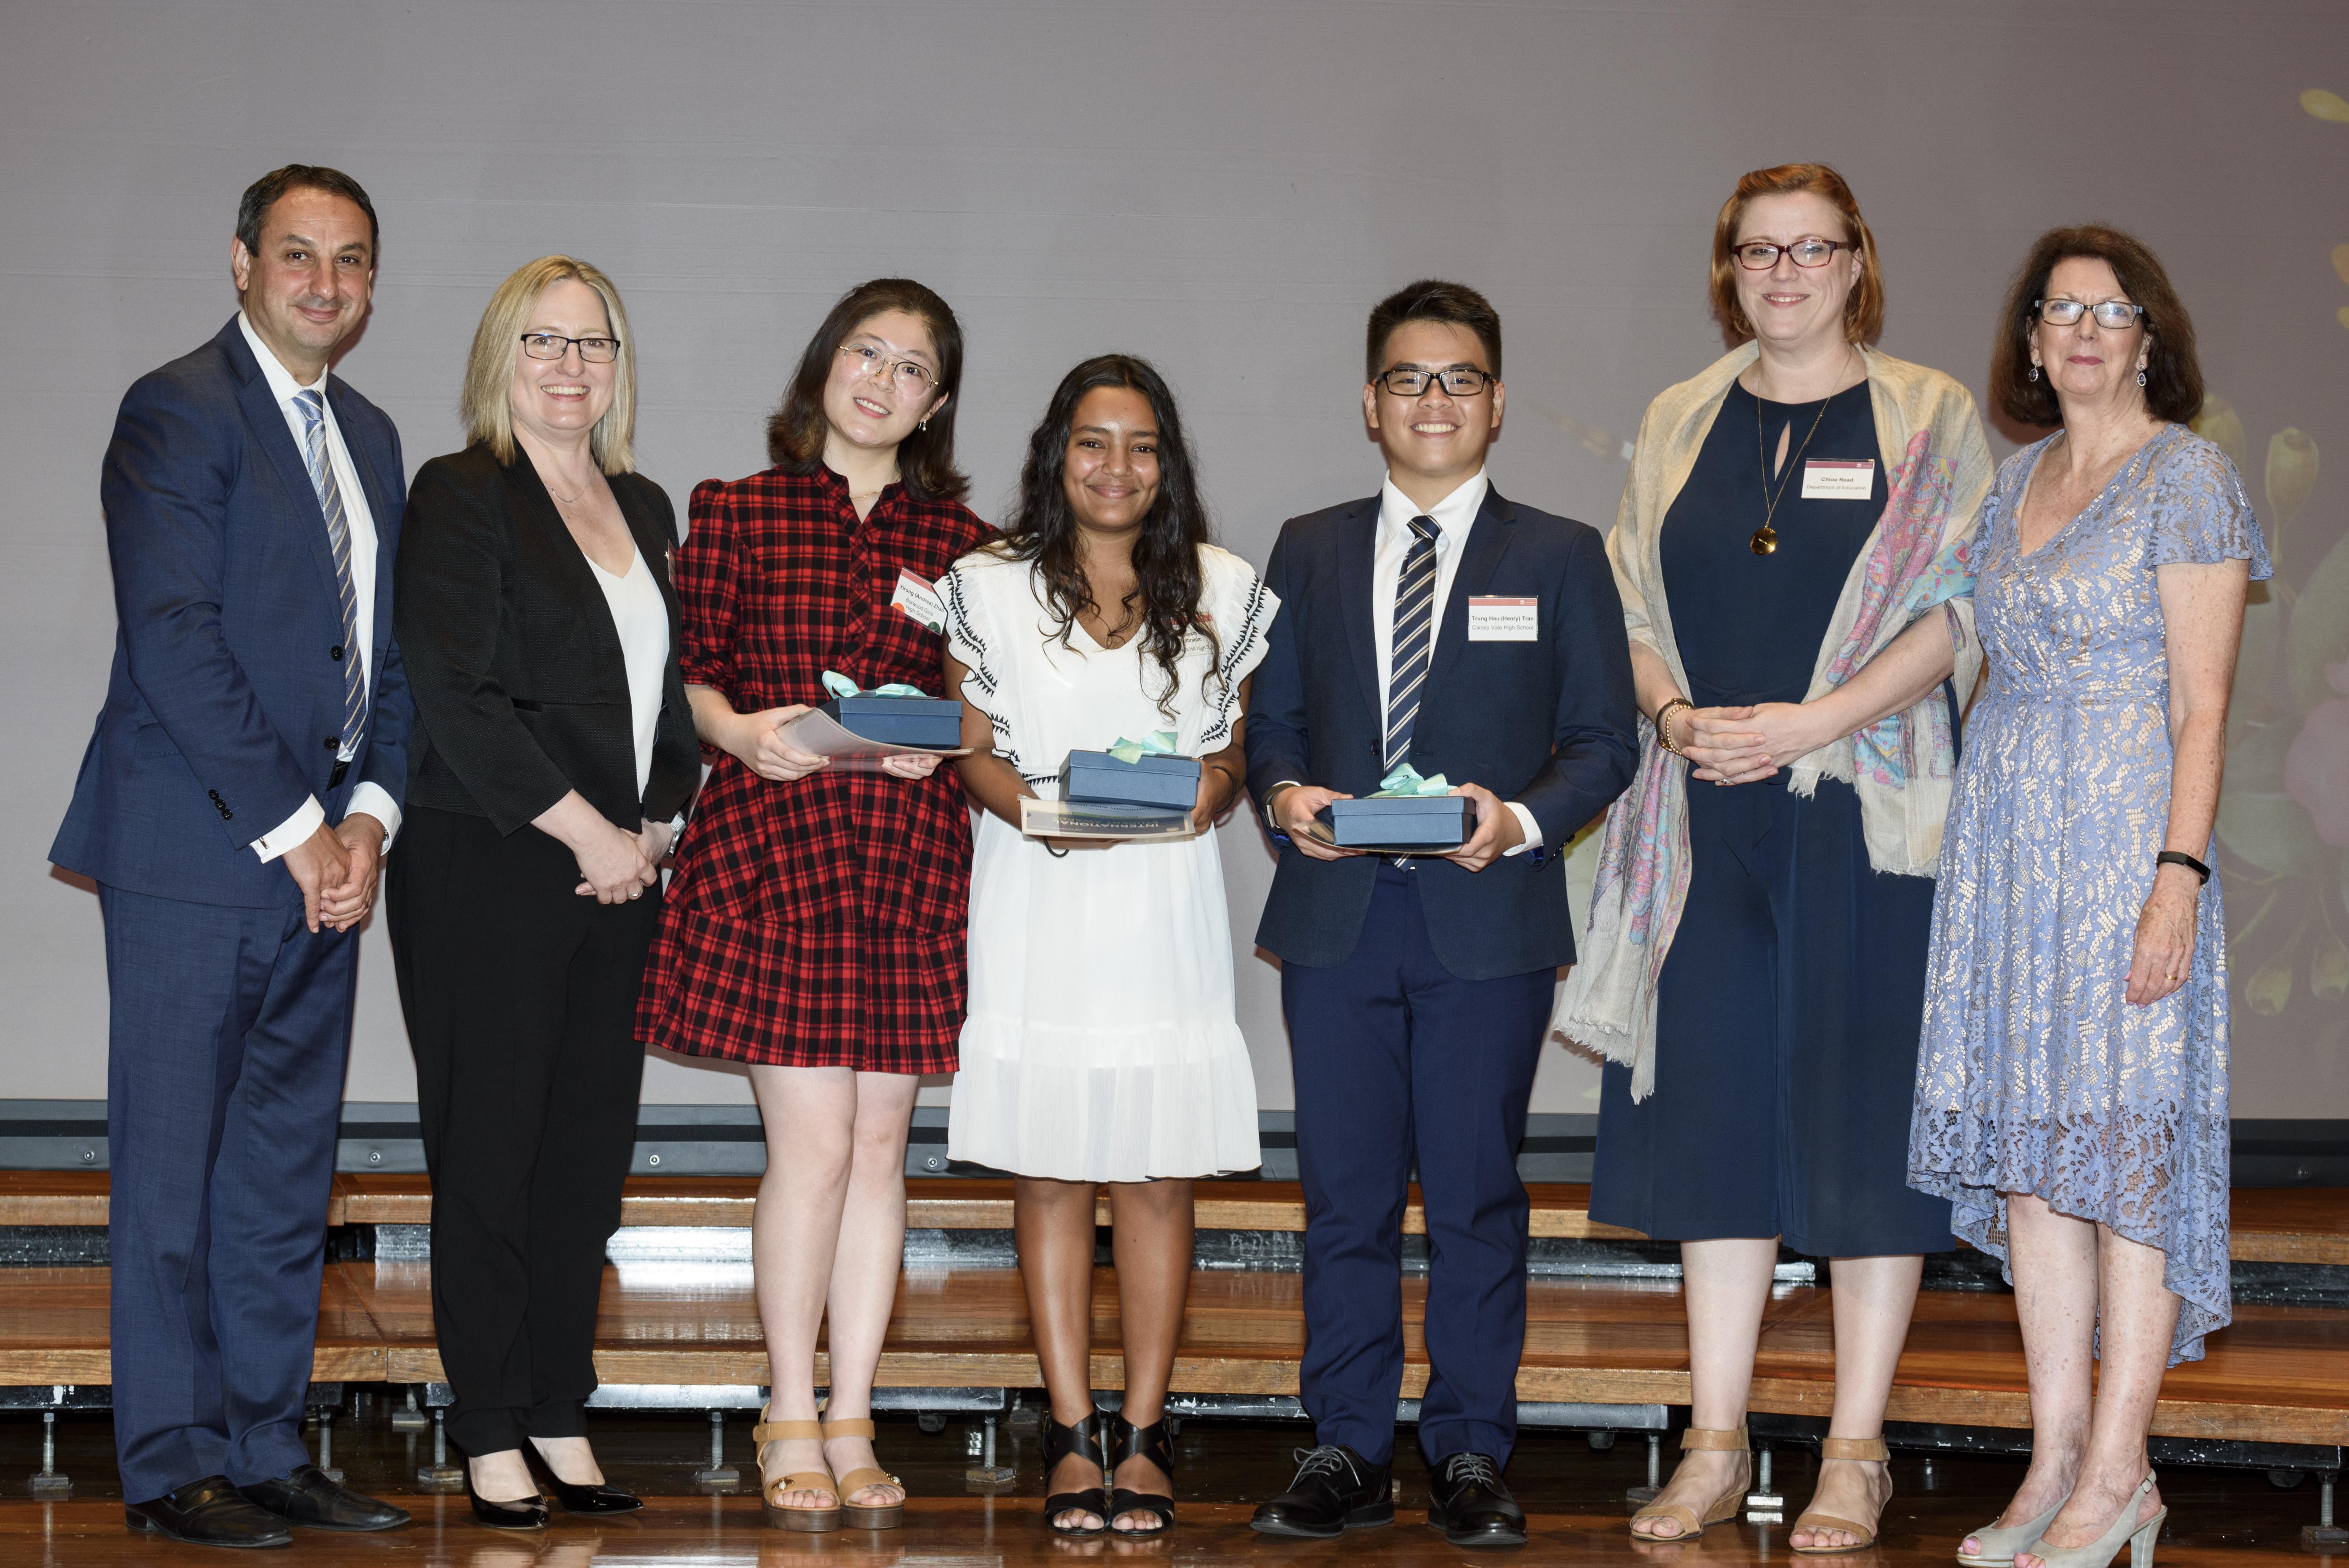 2019 International Student Award winners and officials